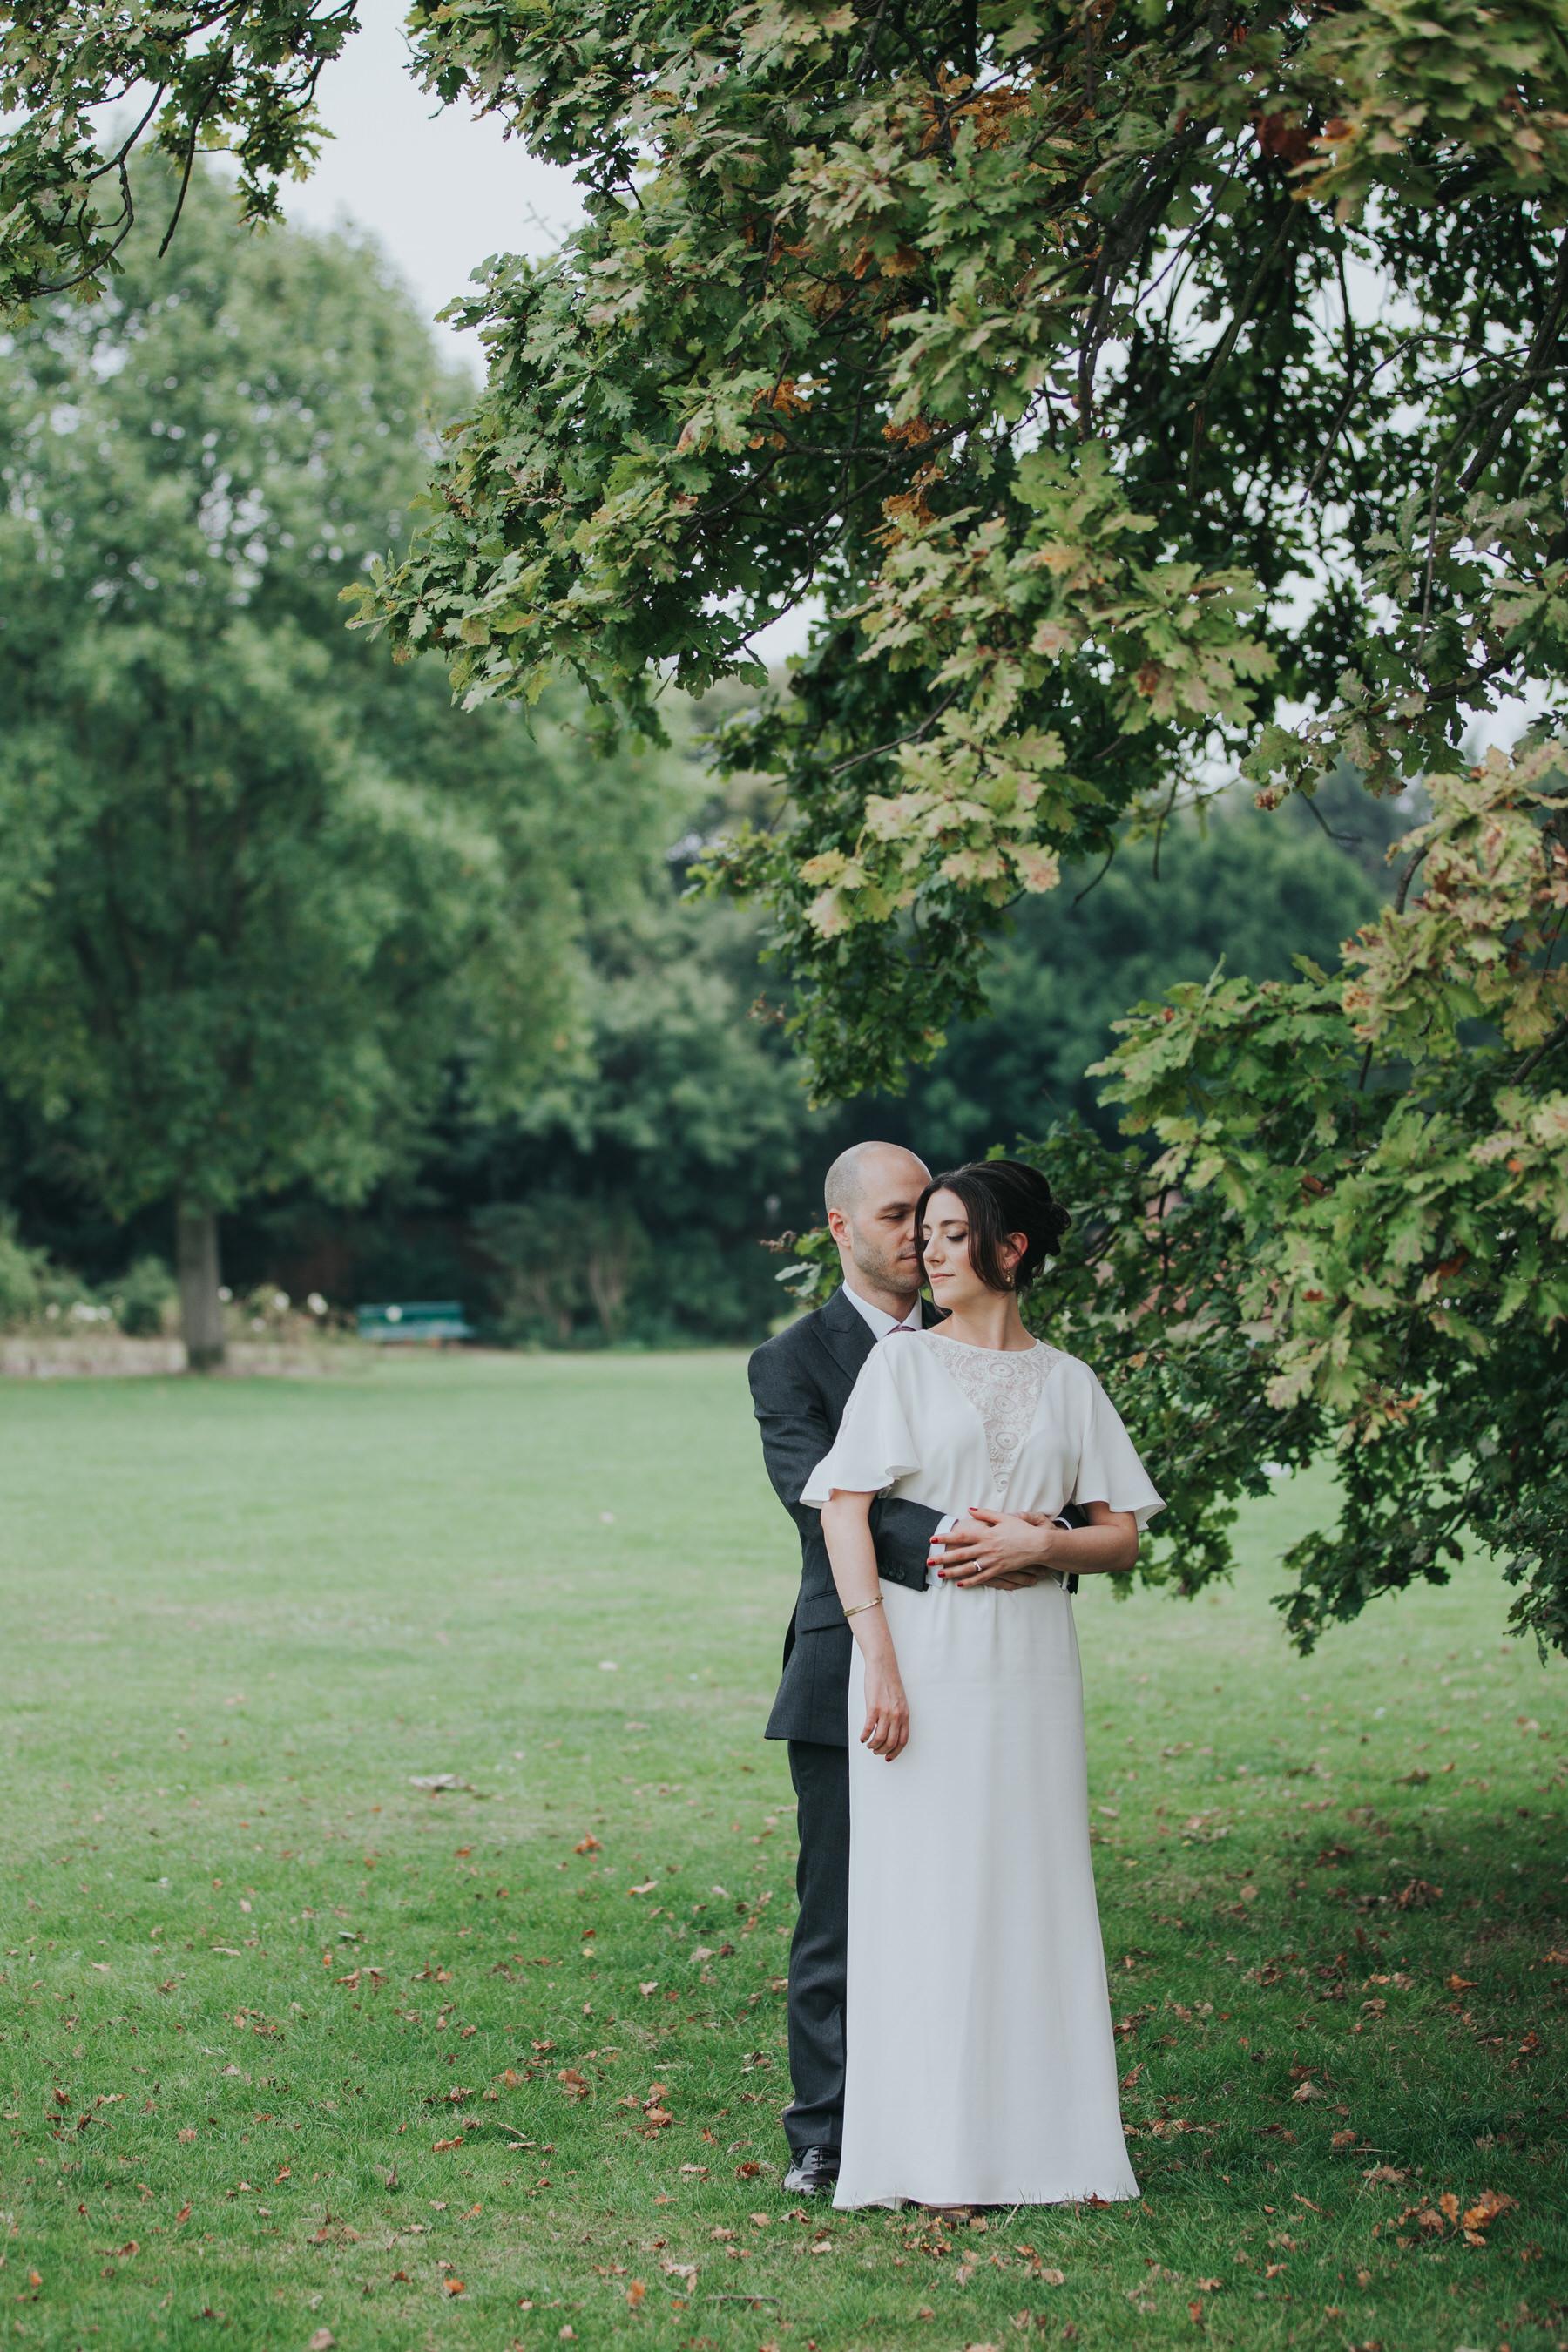 187 Belair Park natural wedding photos unobtrusive.jpg